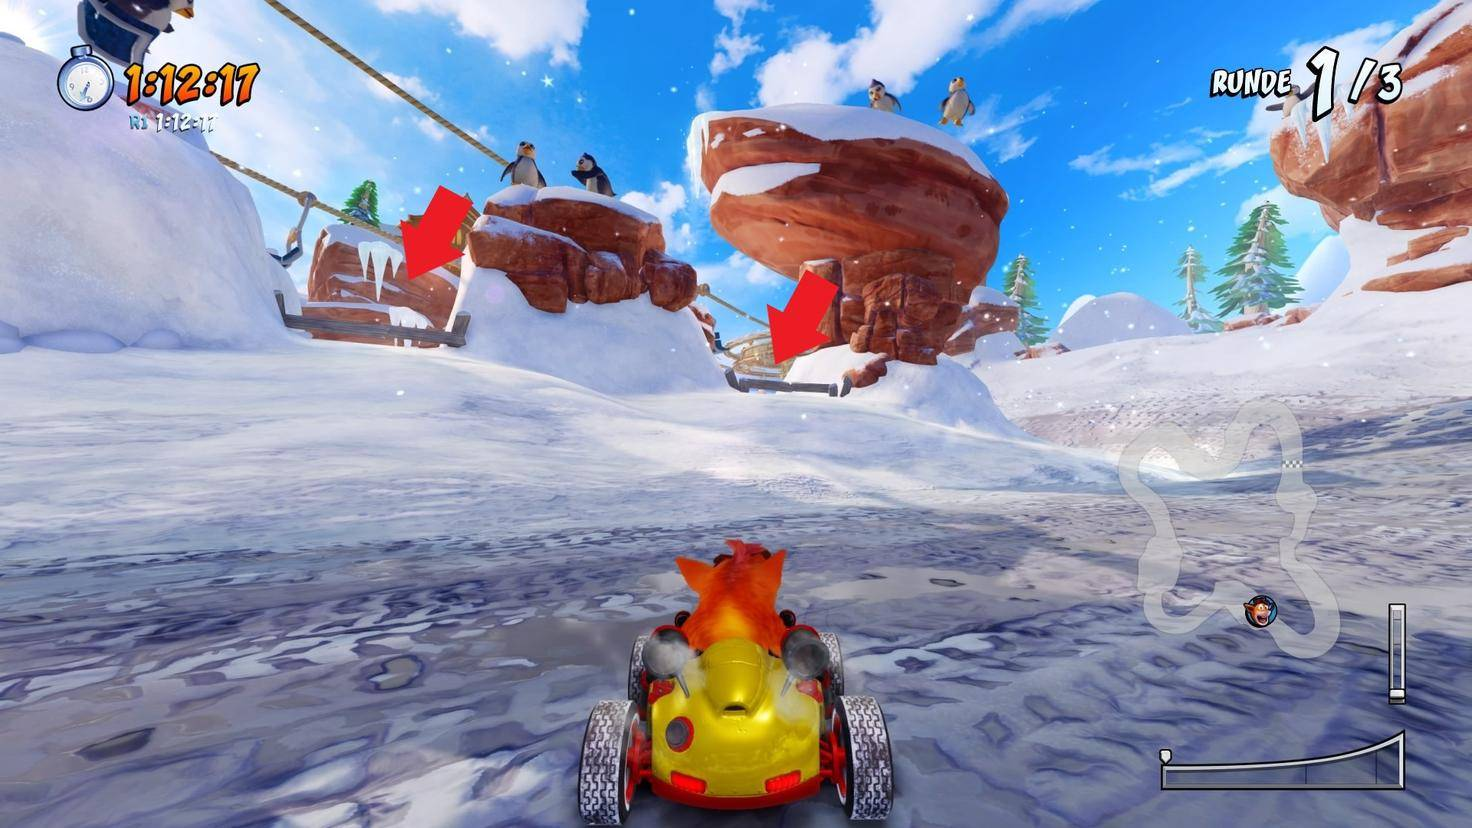 Crash-Team-Racing-Nitro-Fueled-Abkürzung-Blizzard-Bluff-3